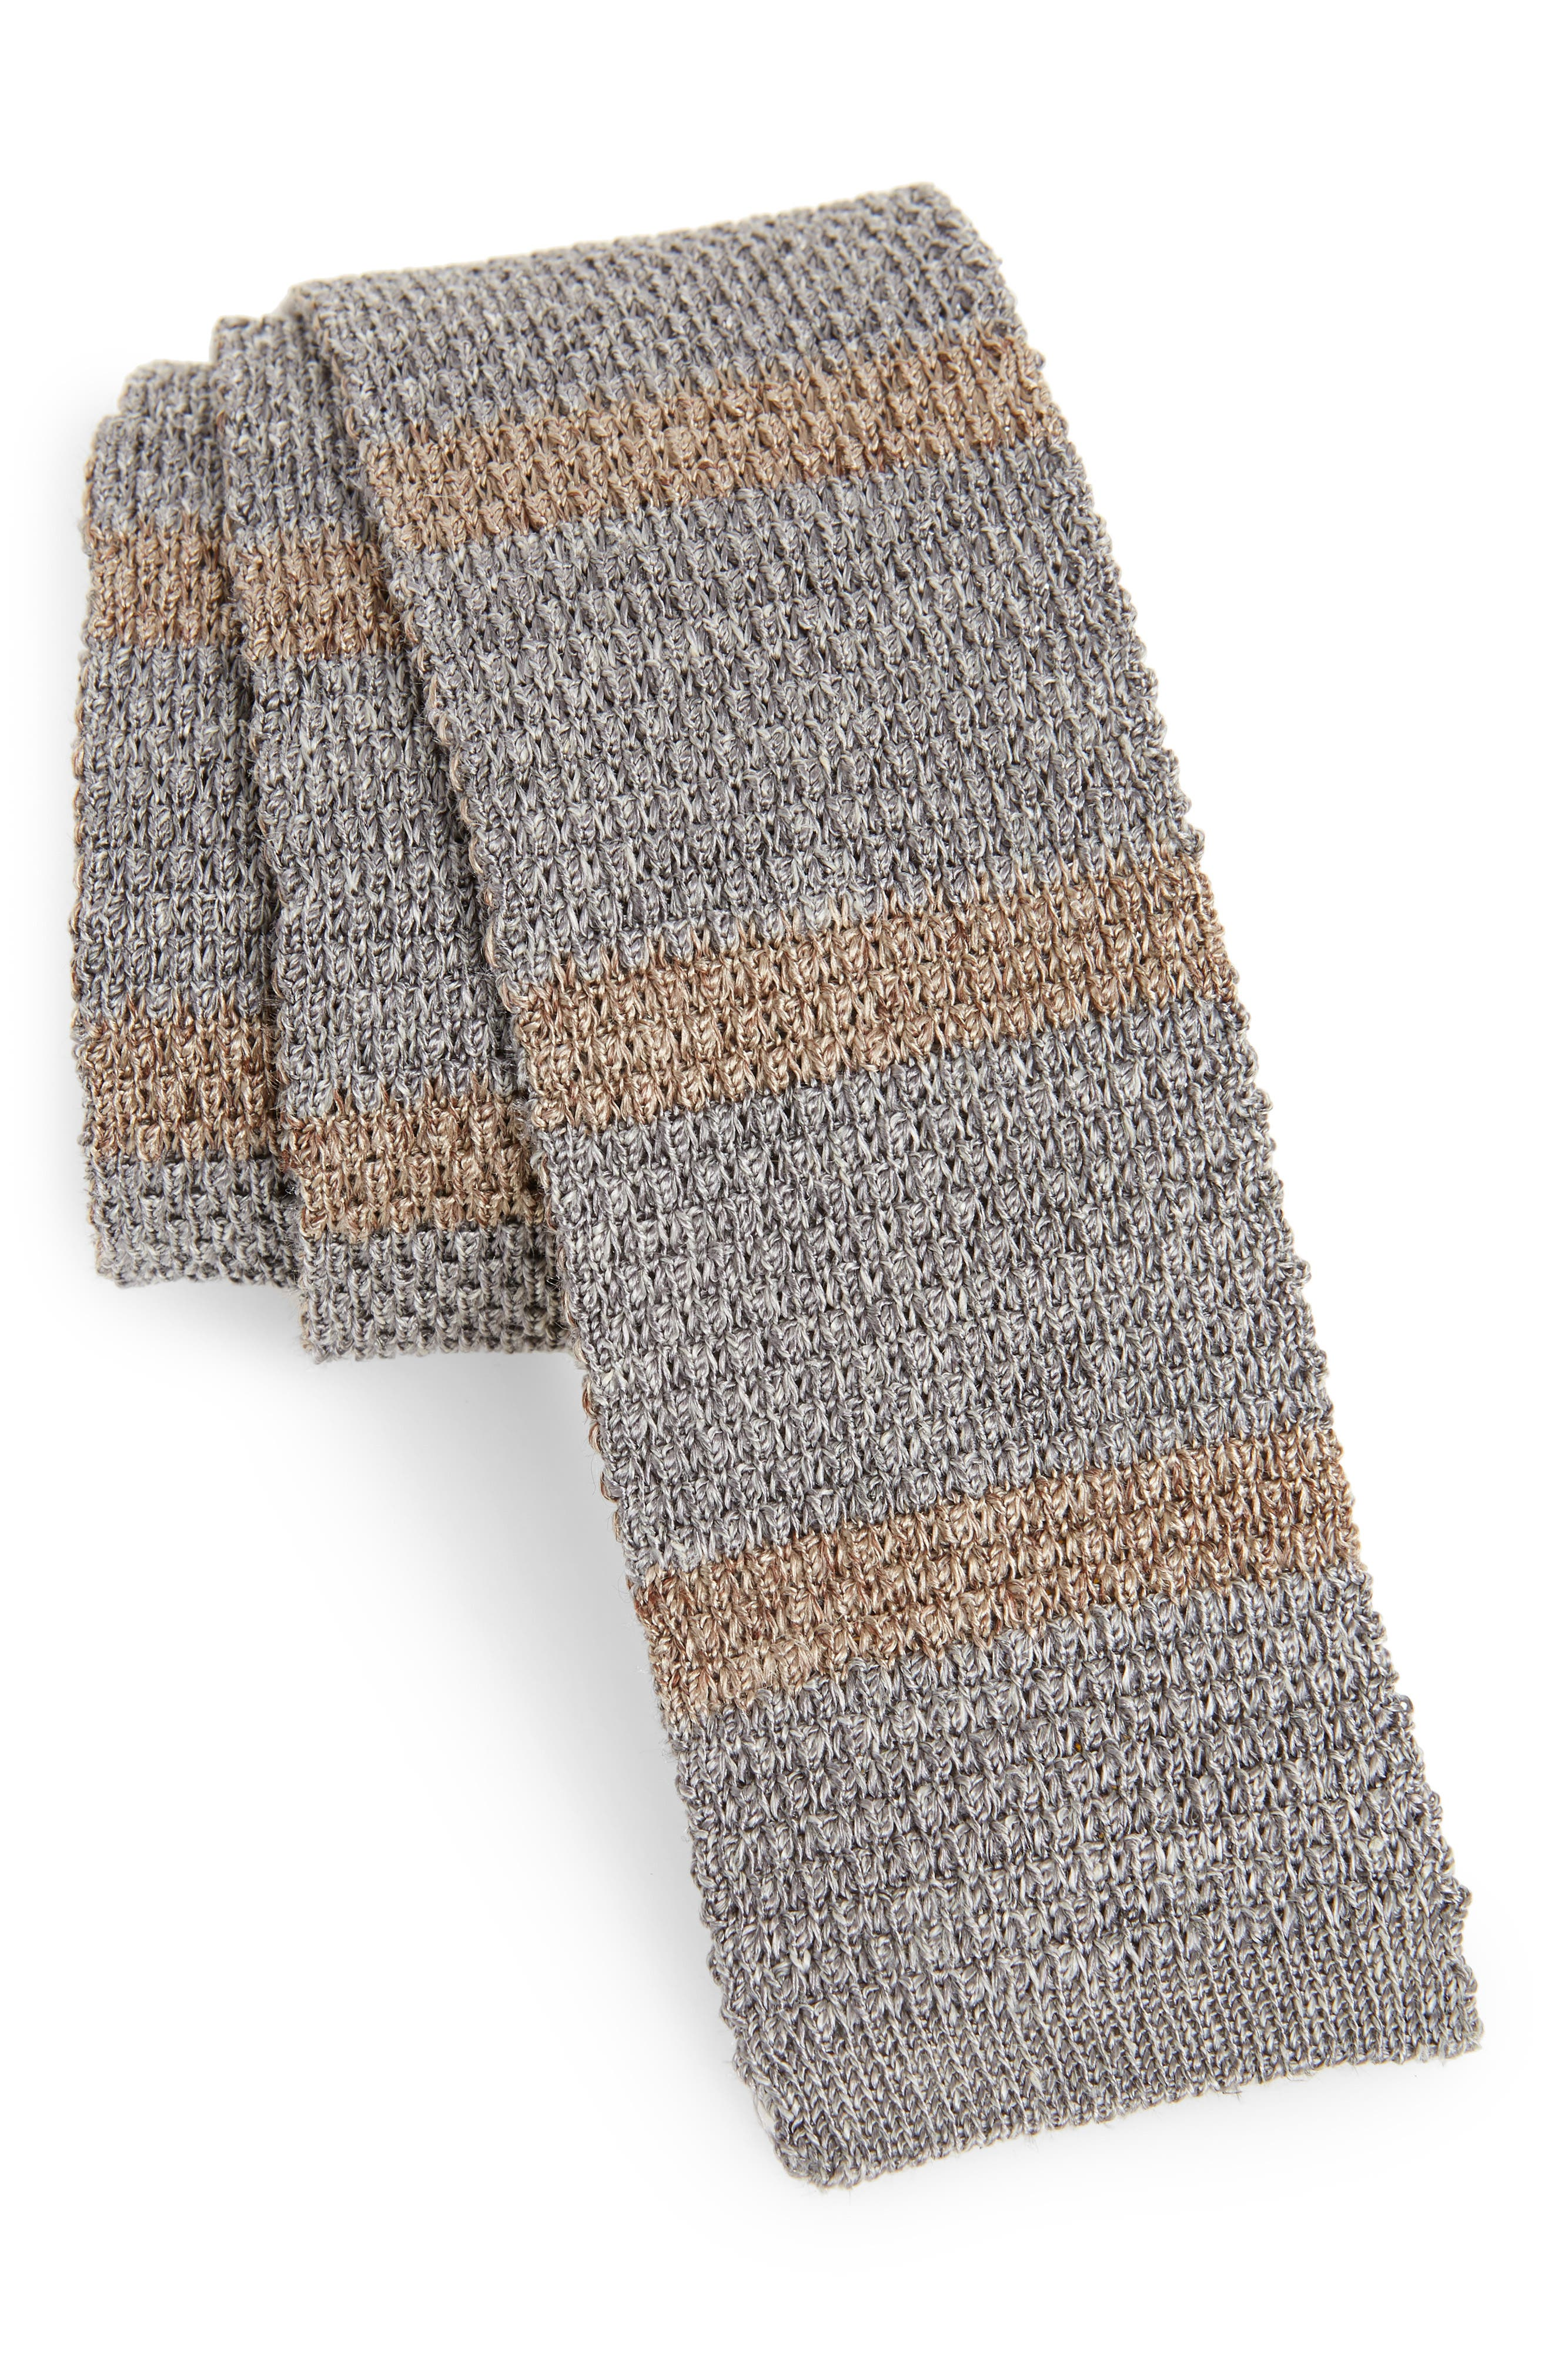 Stripe Skinny Woven Silk & Linen Tie,                         Main,                         color, 020